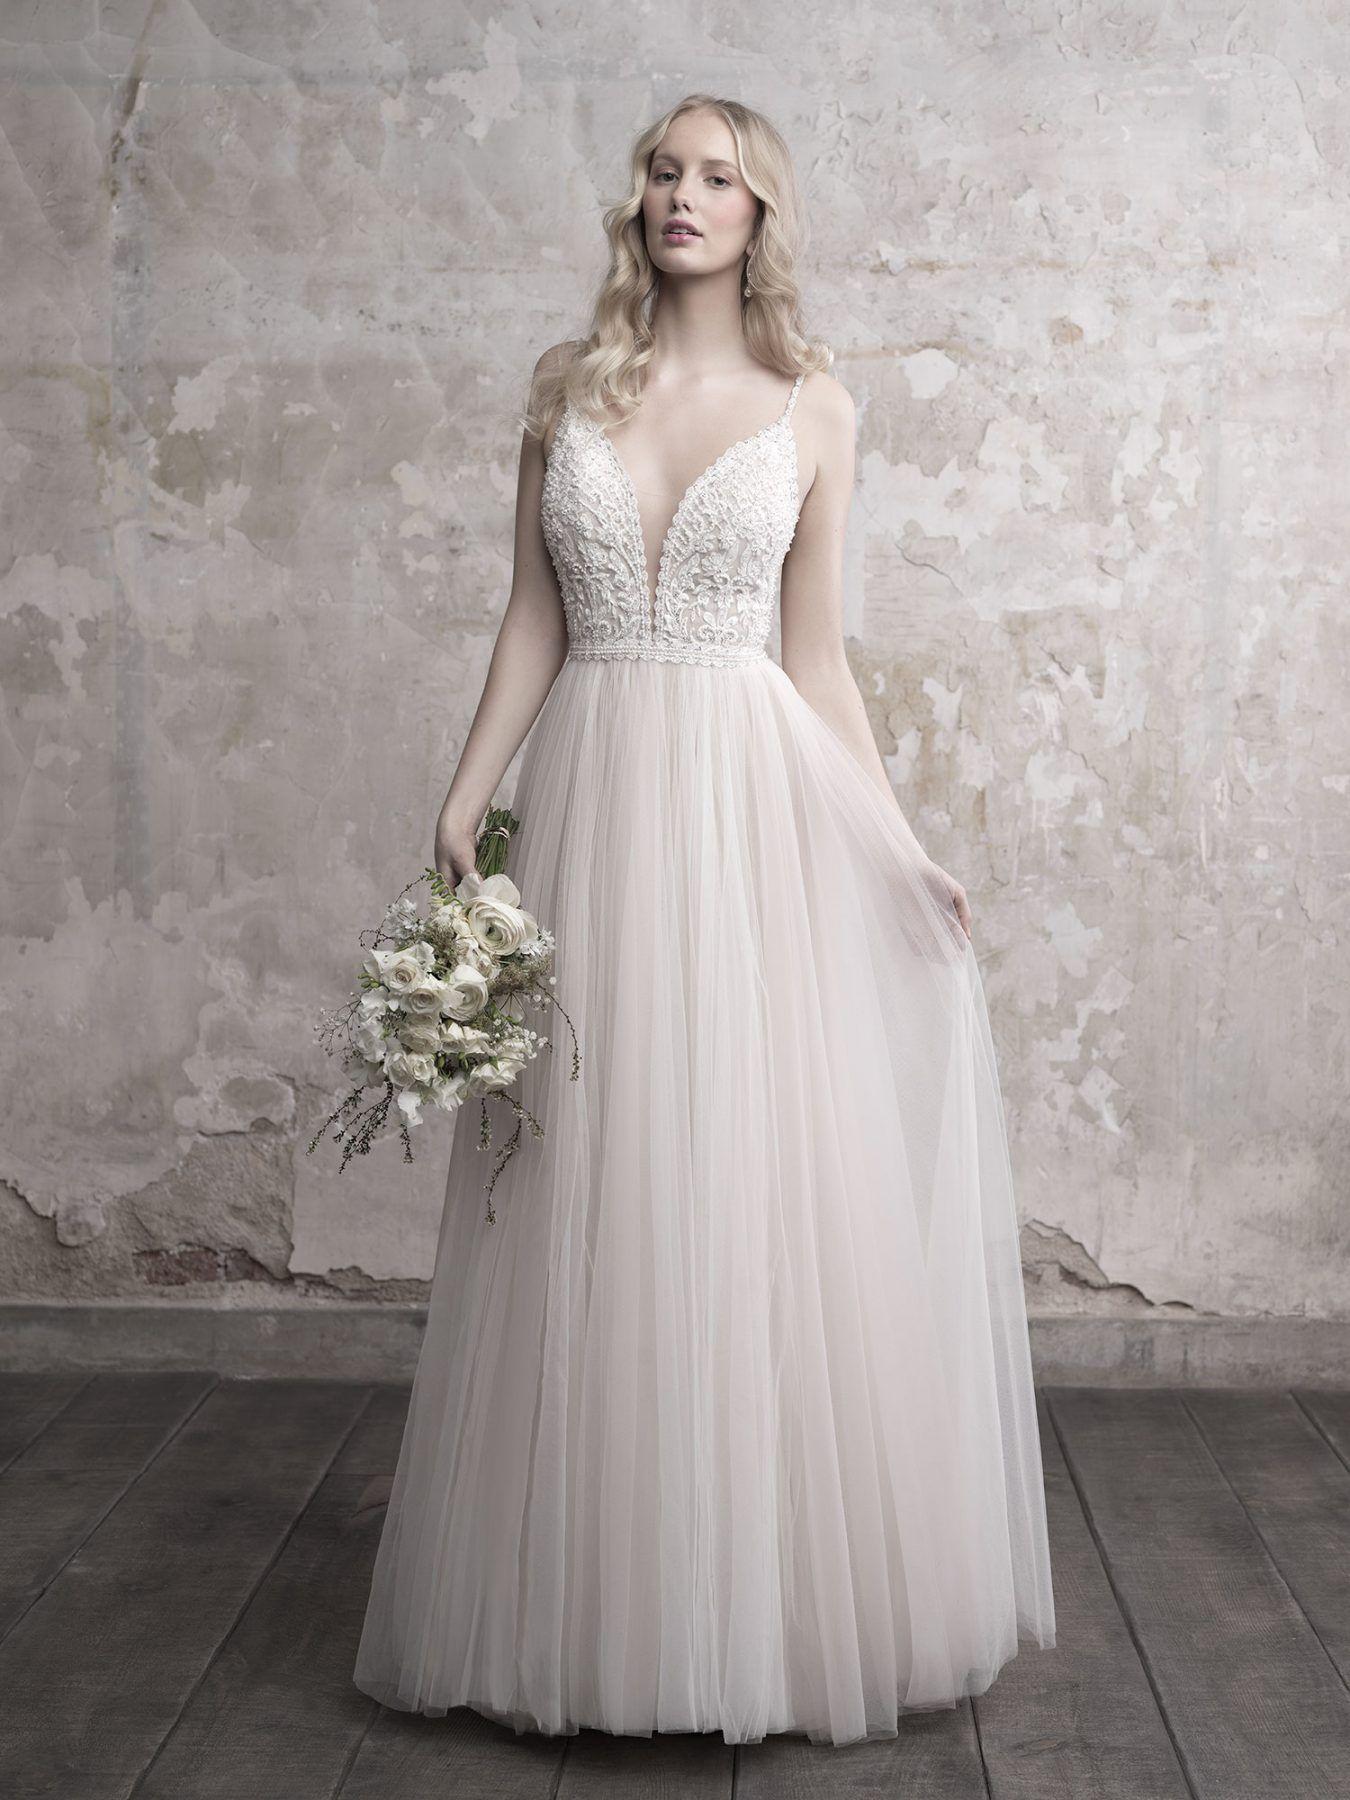 Spaghetti Strap Deep V Neck Lace Bodice Tulle Skirt Wedding Dress Madison James Style Mj45 Madison James Wedding Dress A Line Wedding Dress Allure Bridal